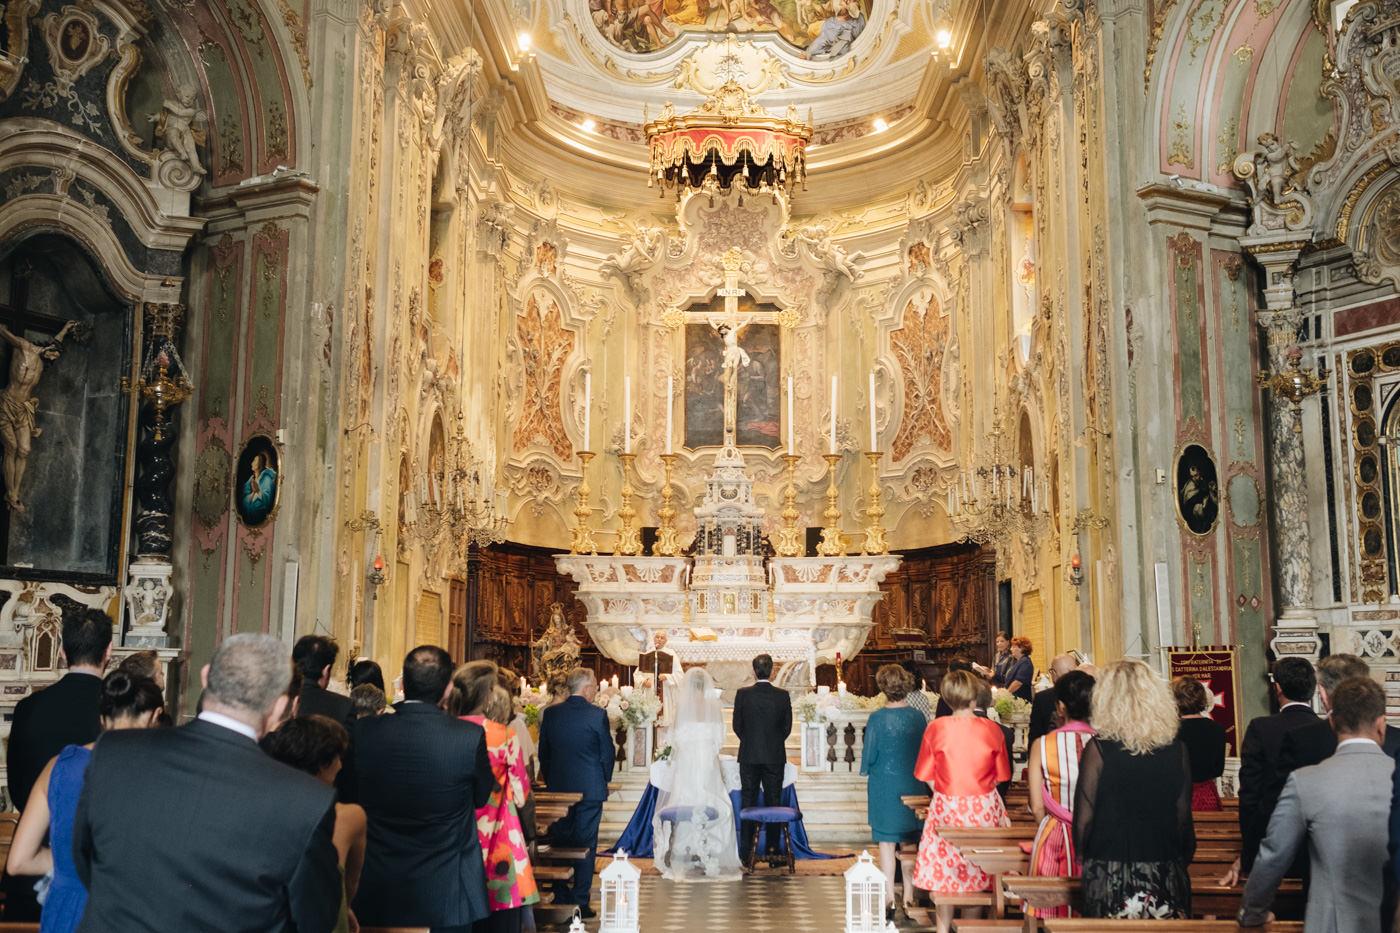 matrimoni_all_italiana_fotografo_matrimonio_cinque_terre-24.jpg